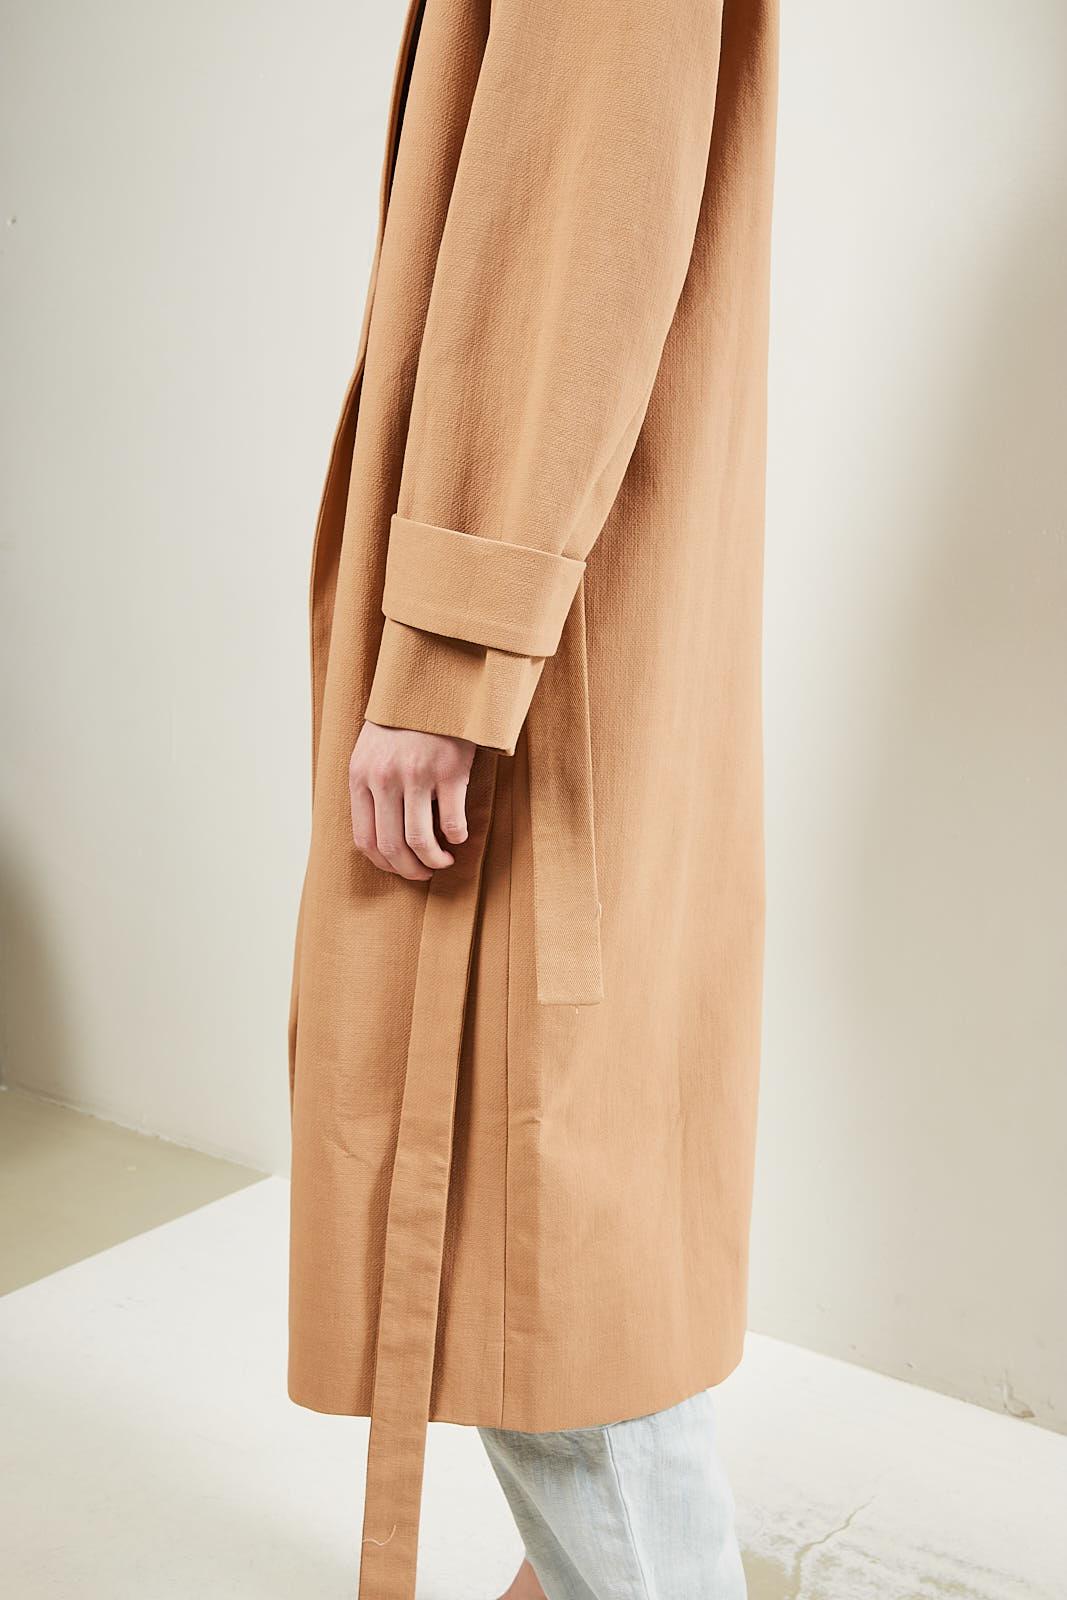 Humanoid - Femm fawcett coat